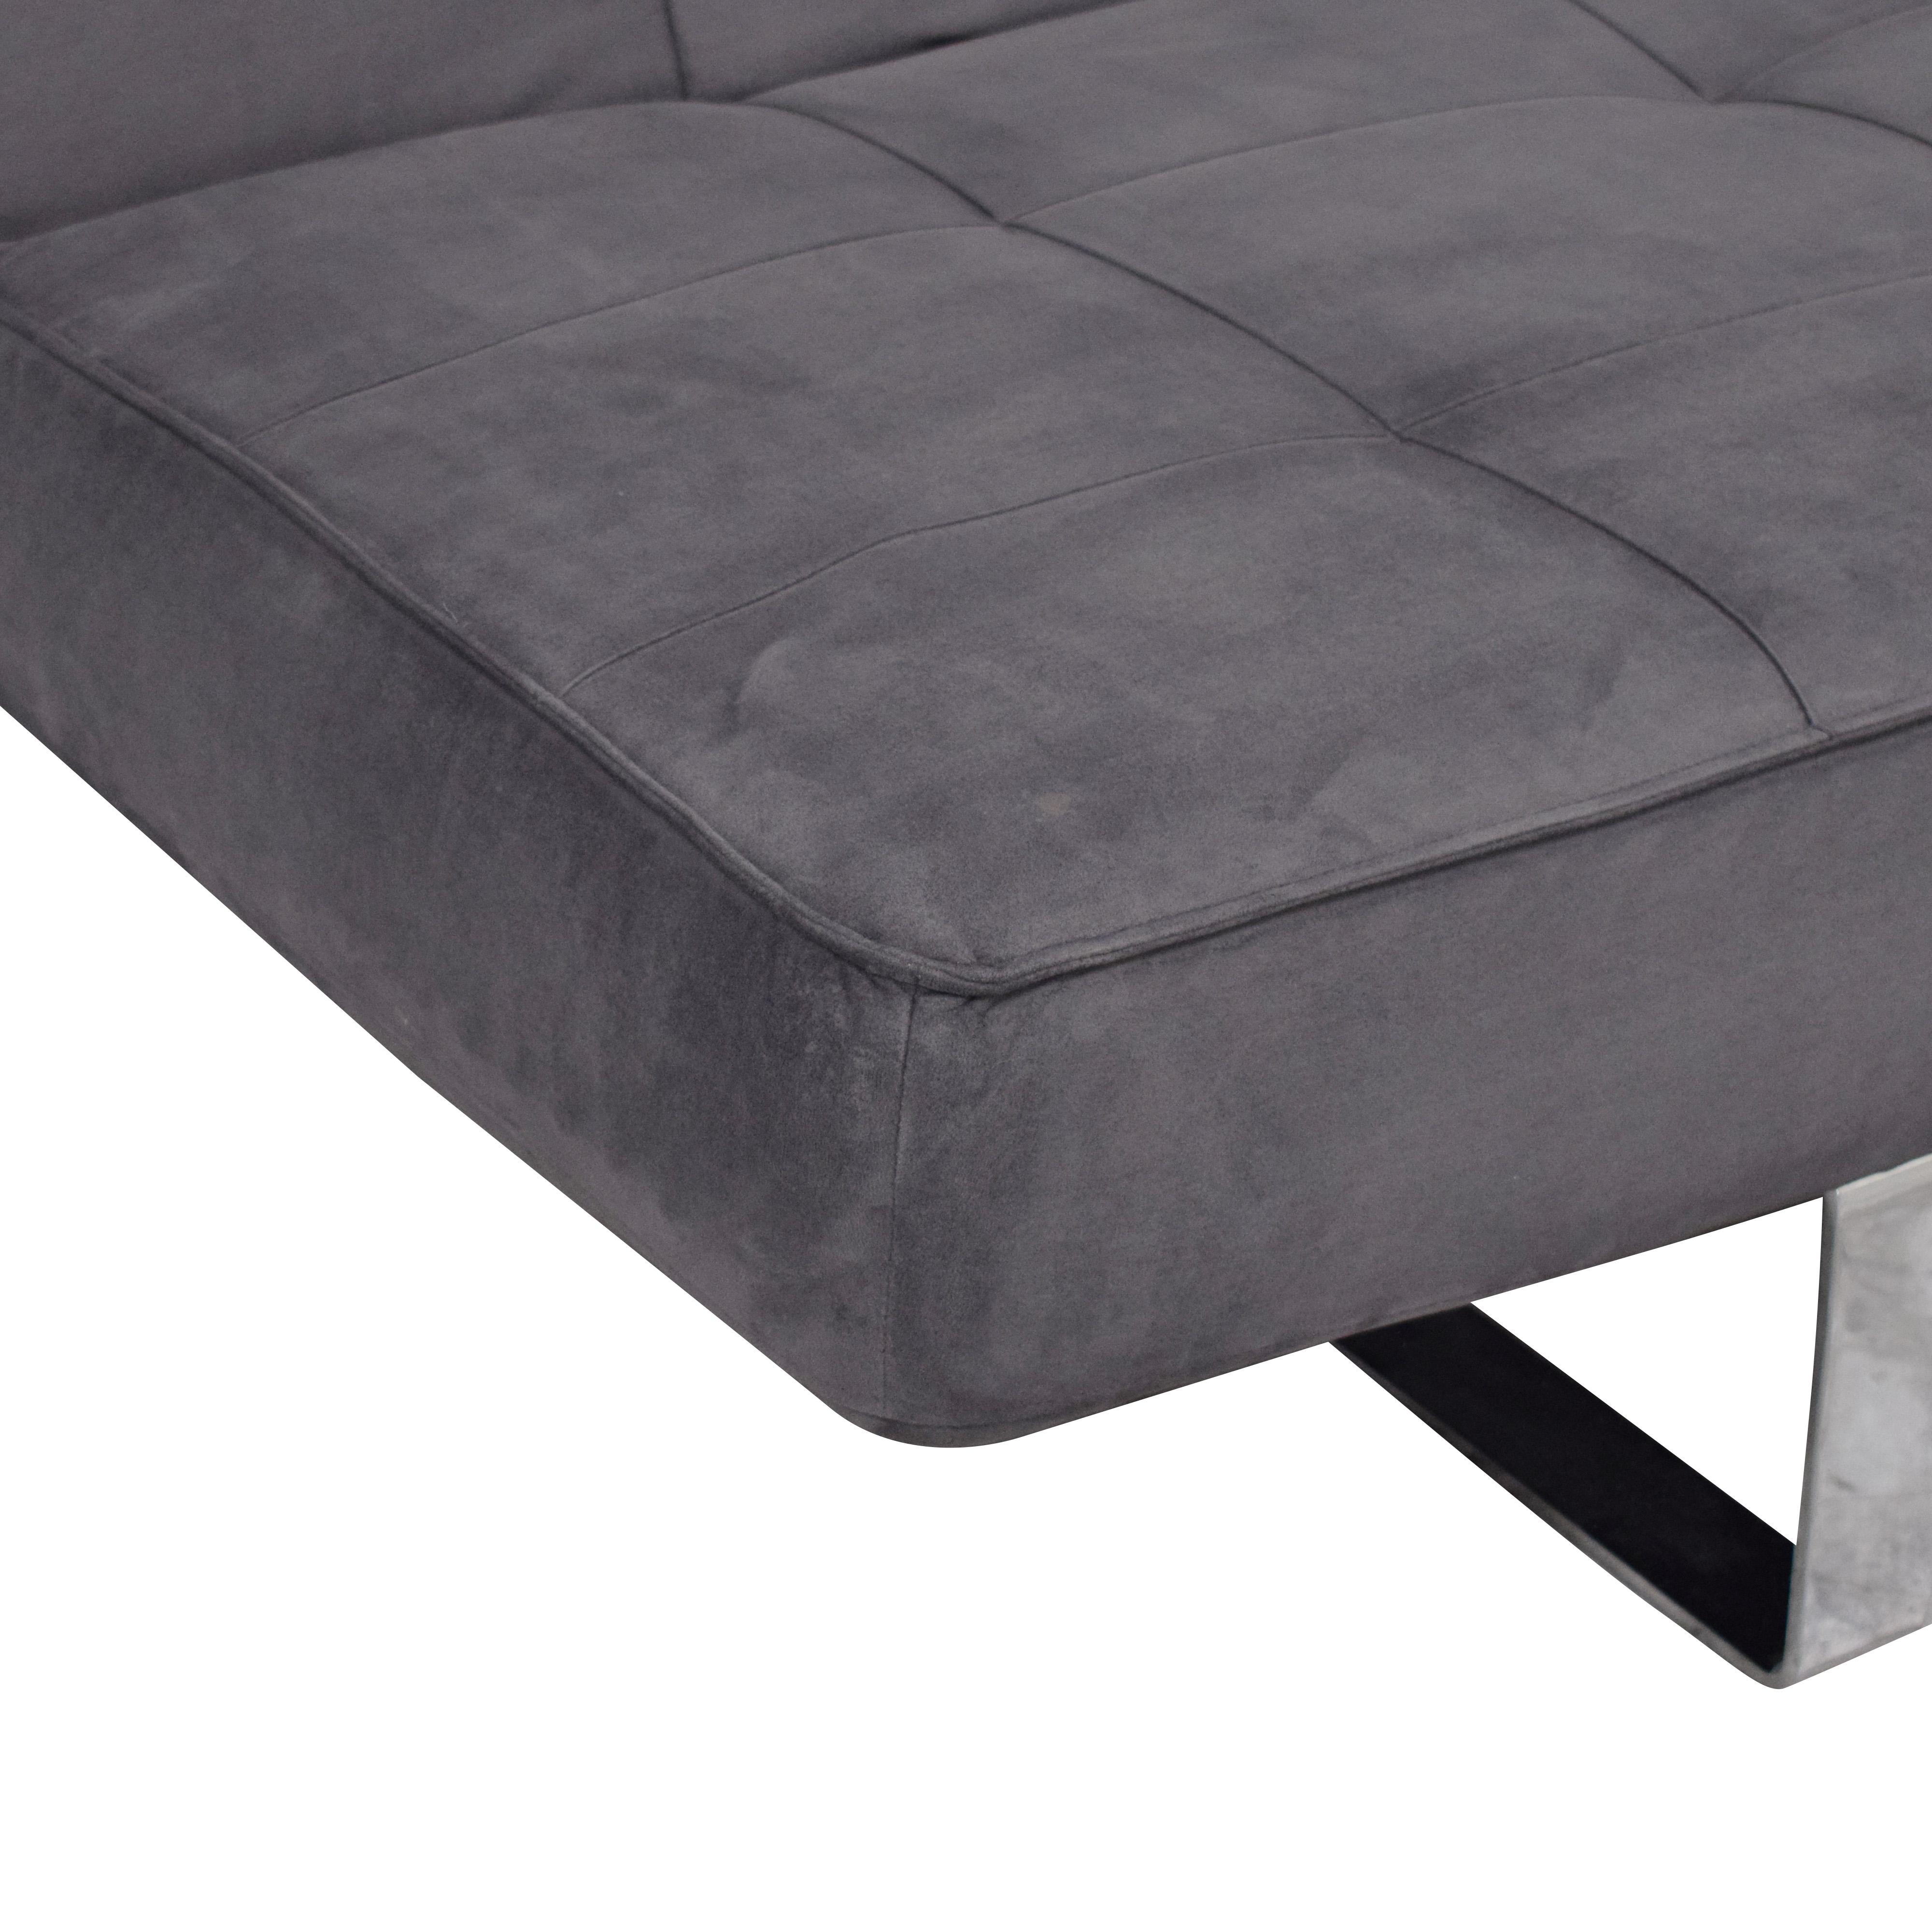 BoConcept Sleeper Sofa Bed BoConcept